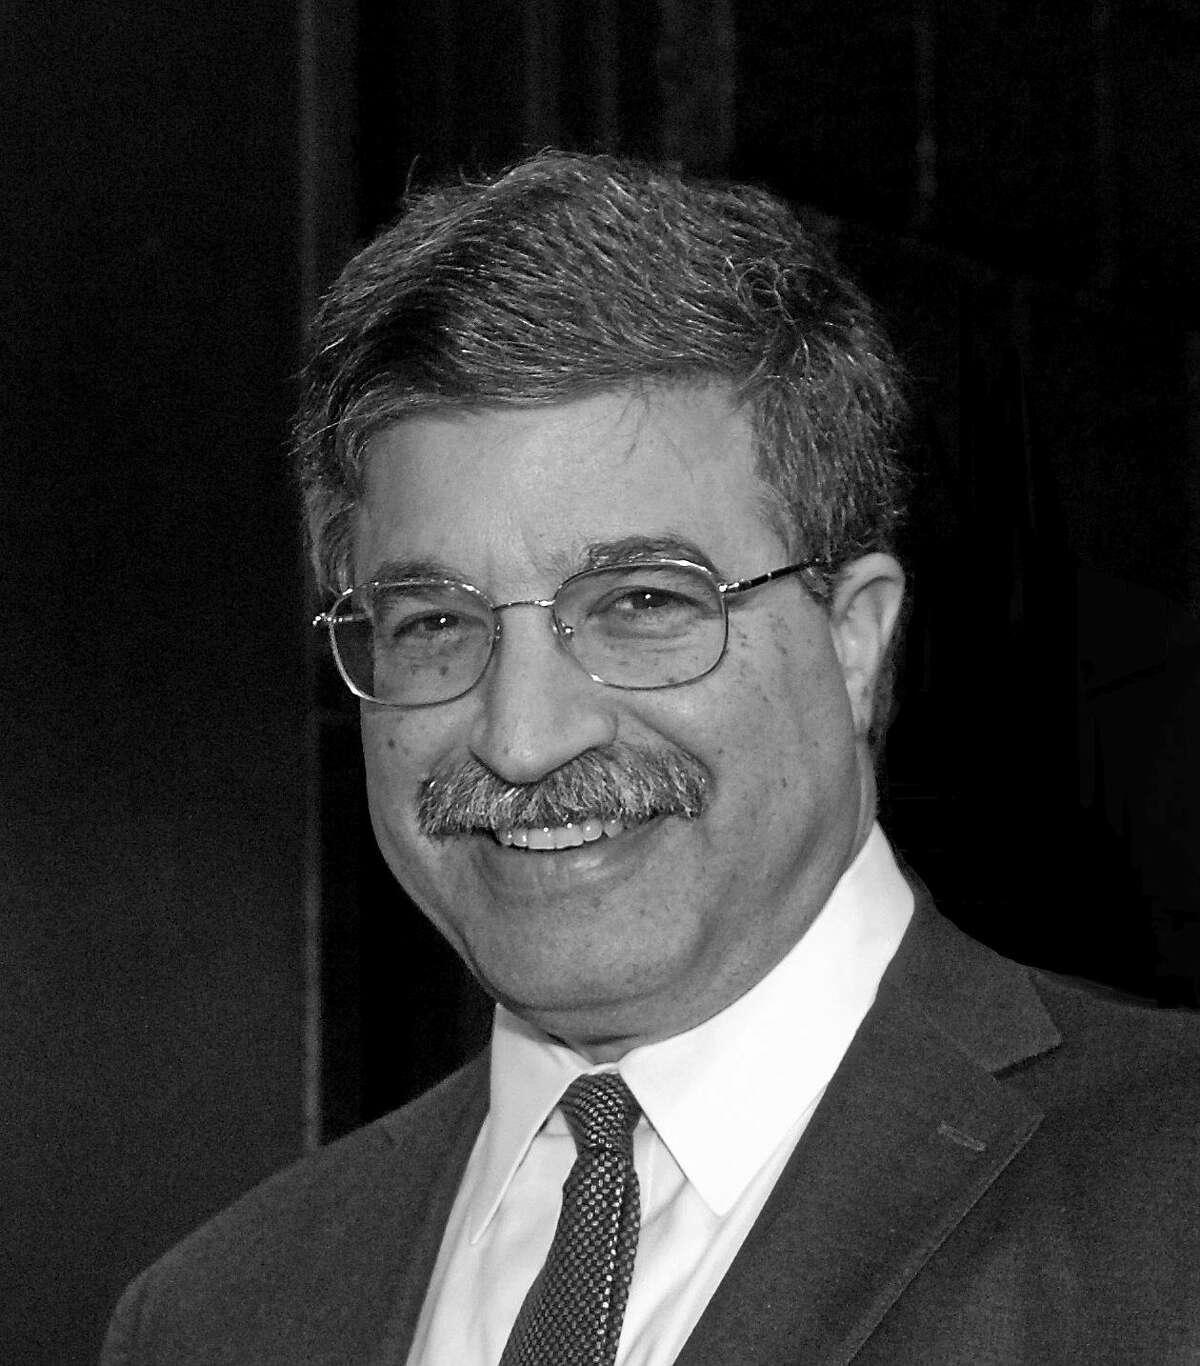 William W. Ginsberg